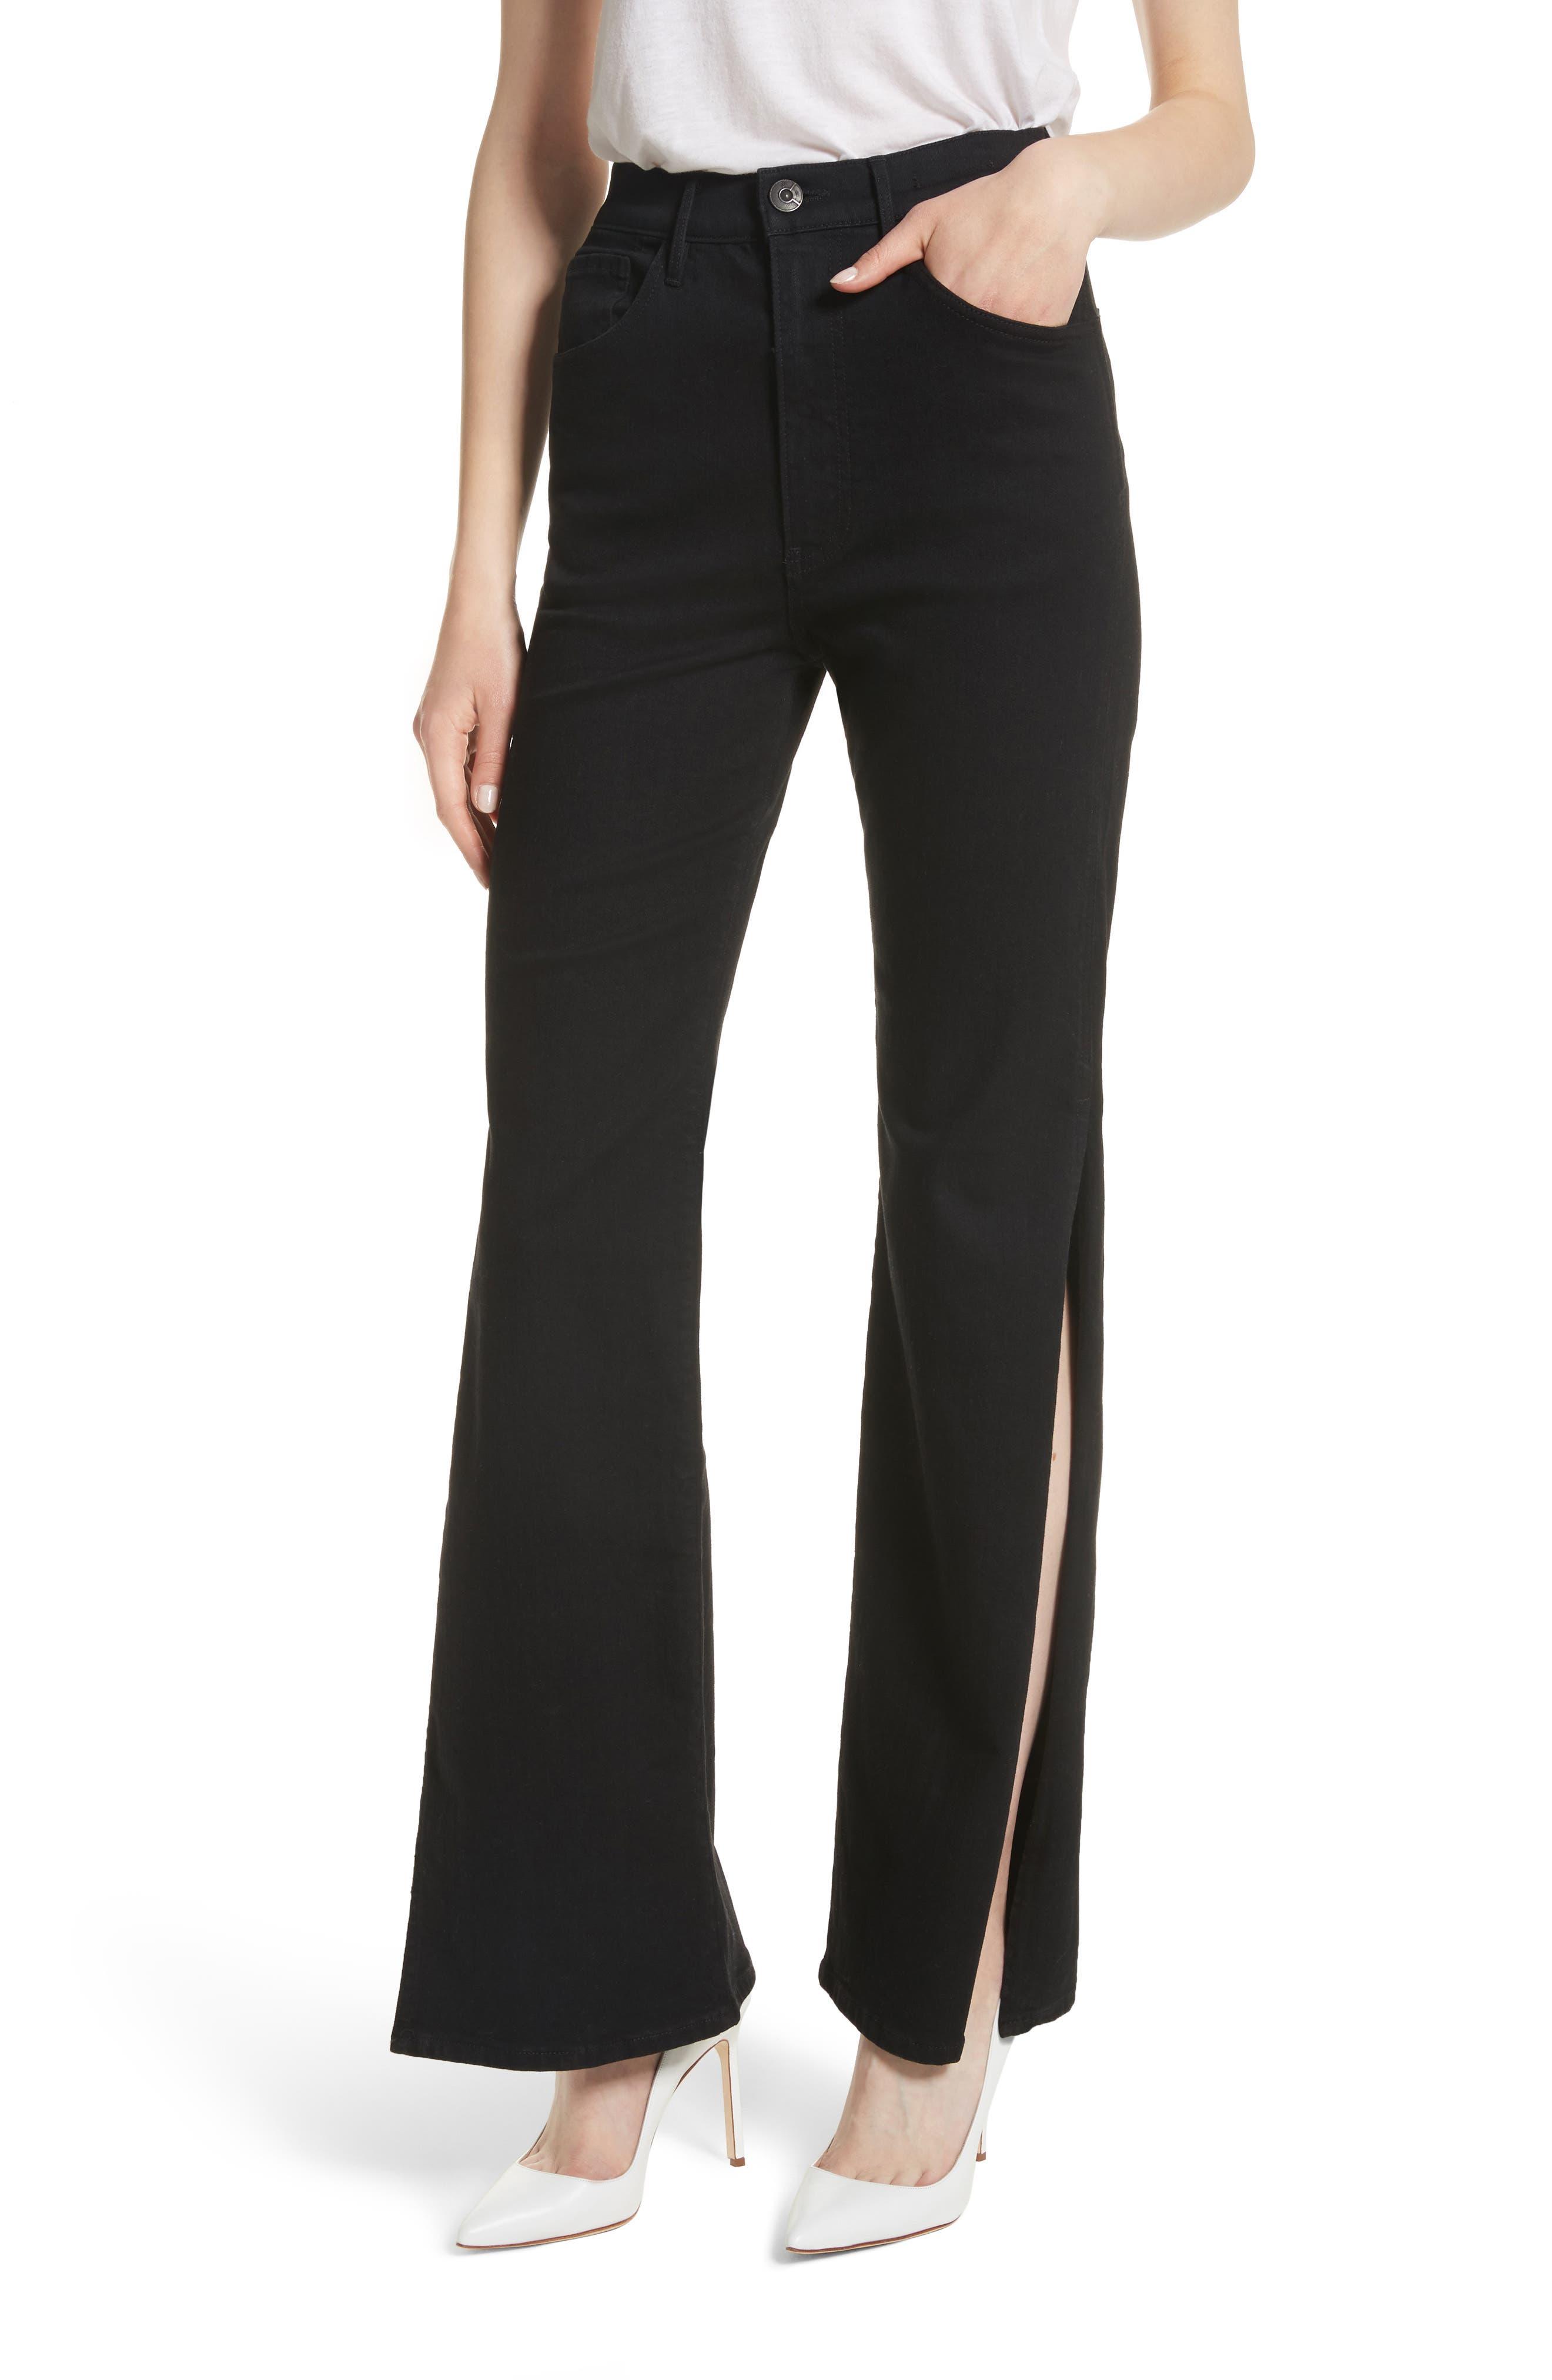 W4 Adeline High Waist Split Flare Jeans,                             Main thumbnail 1, color,                             Black No 1